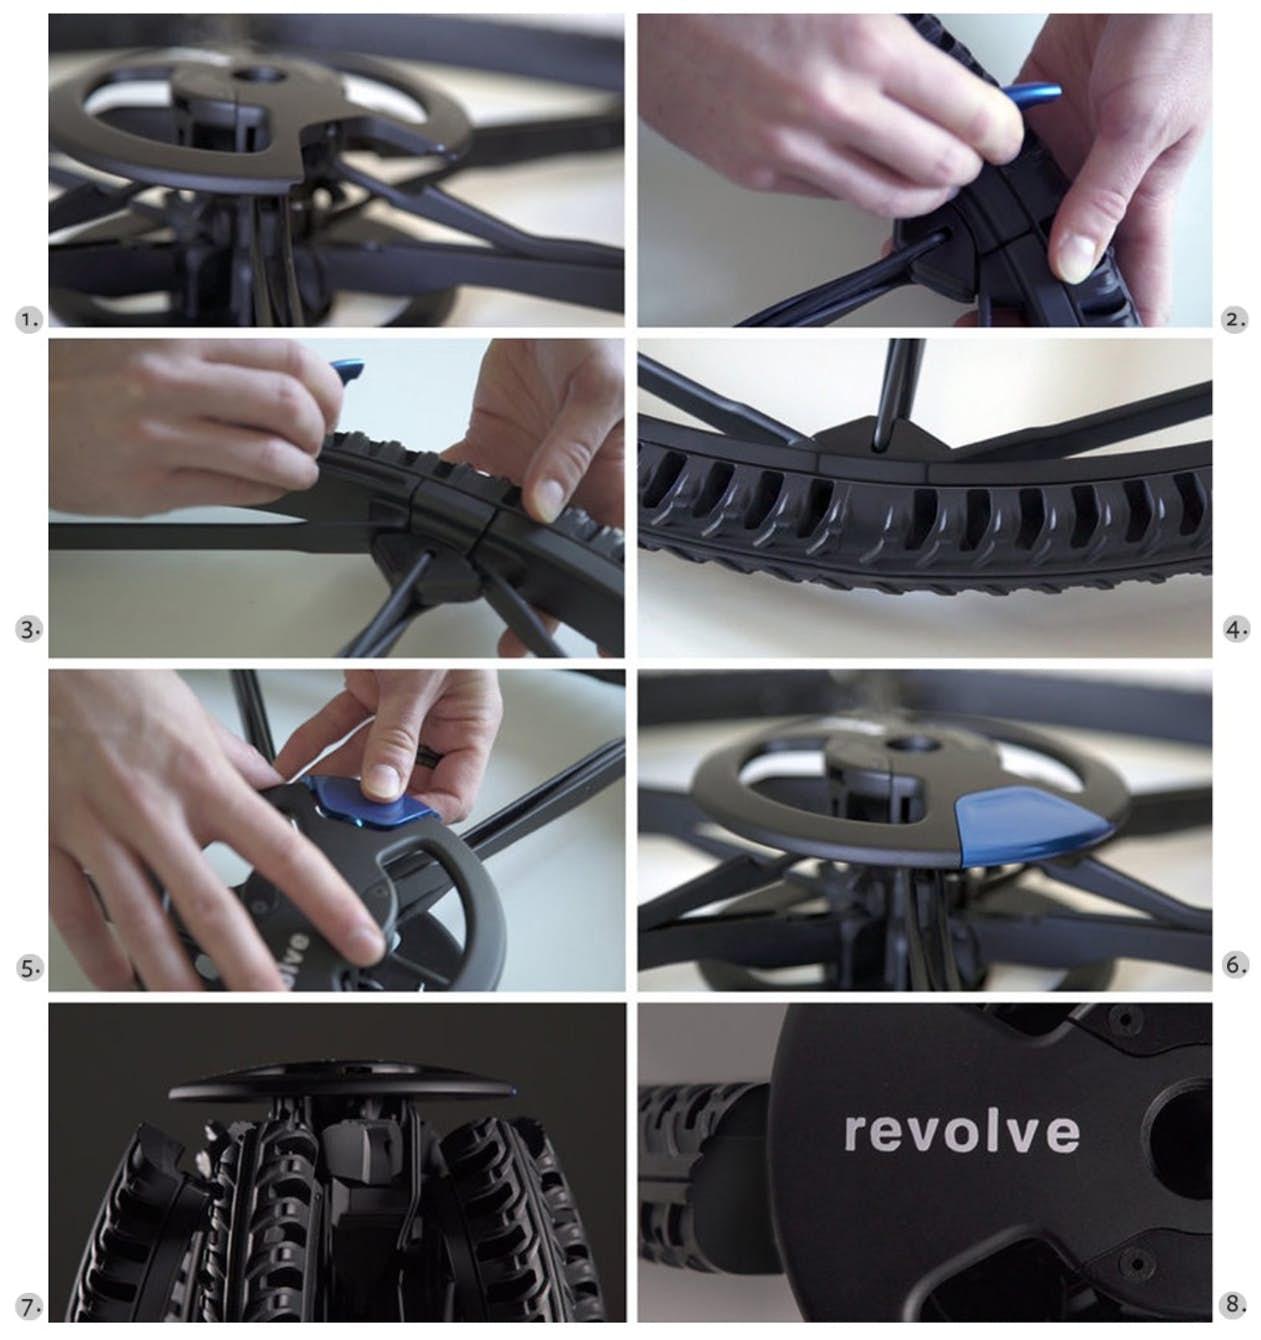 revolve-wheel-5